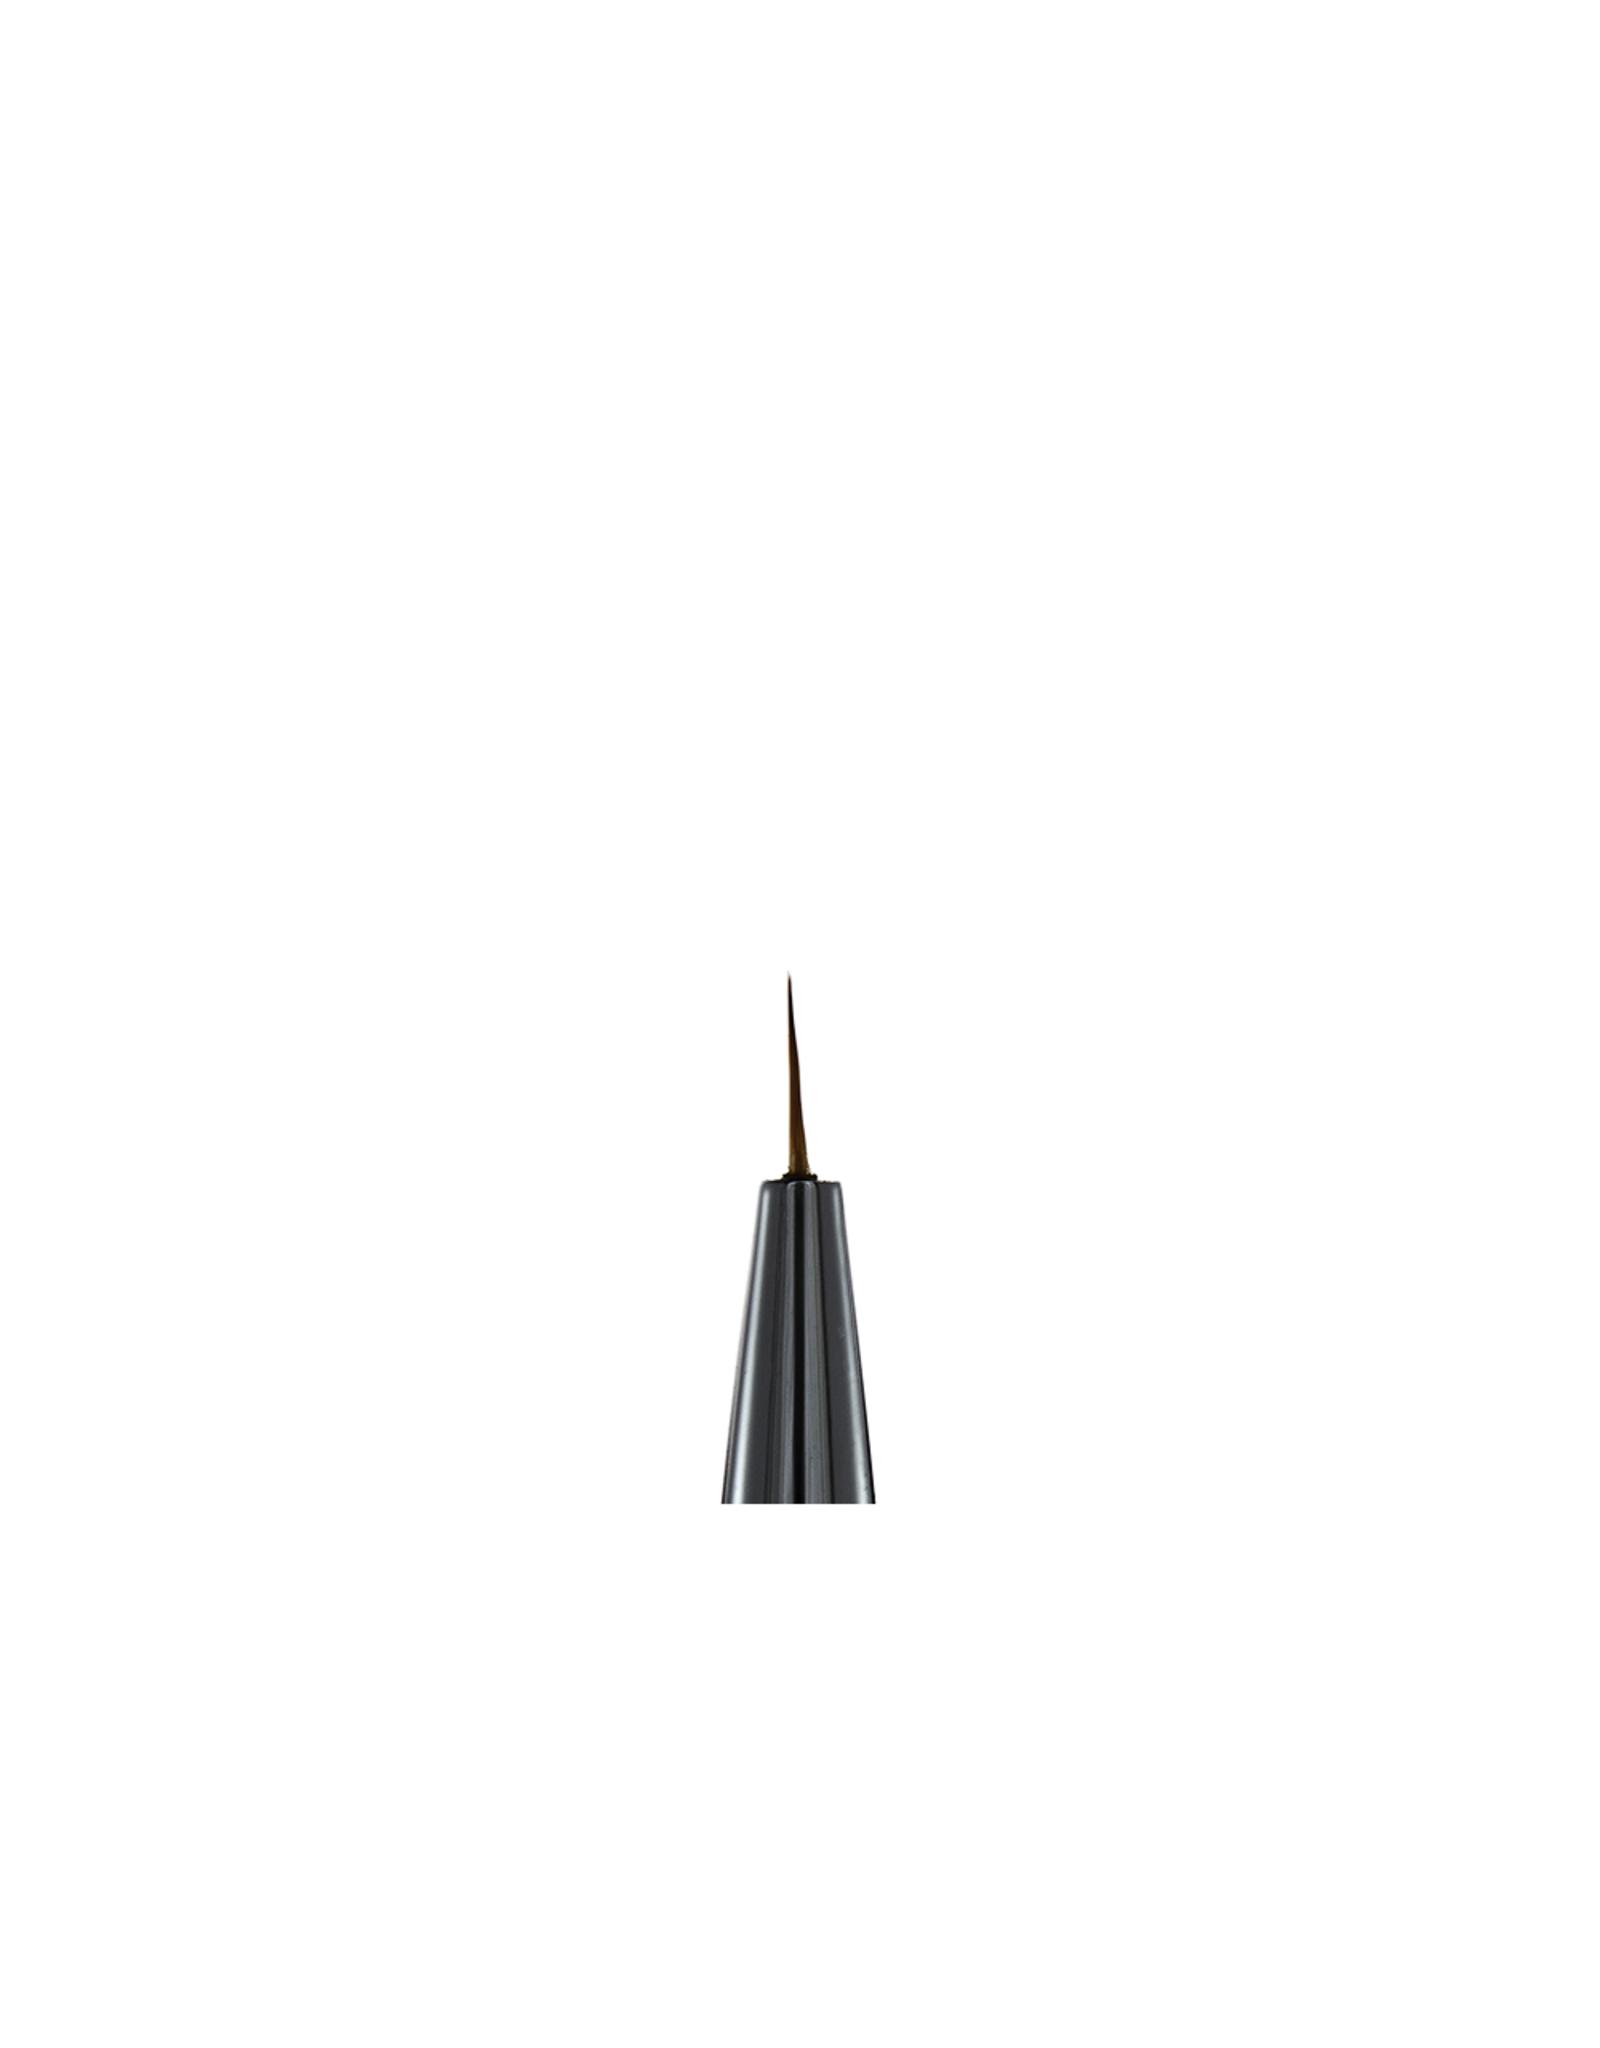 Nail Art Brush, 5mm